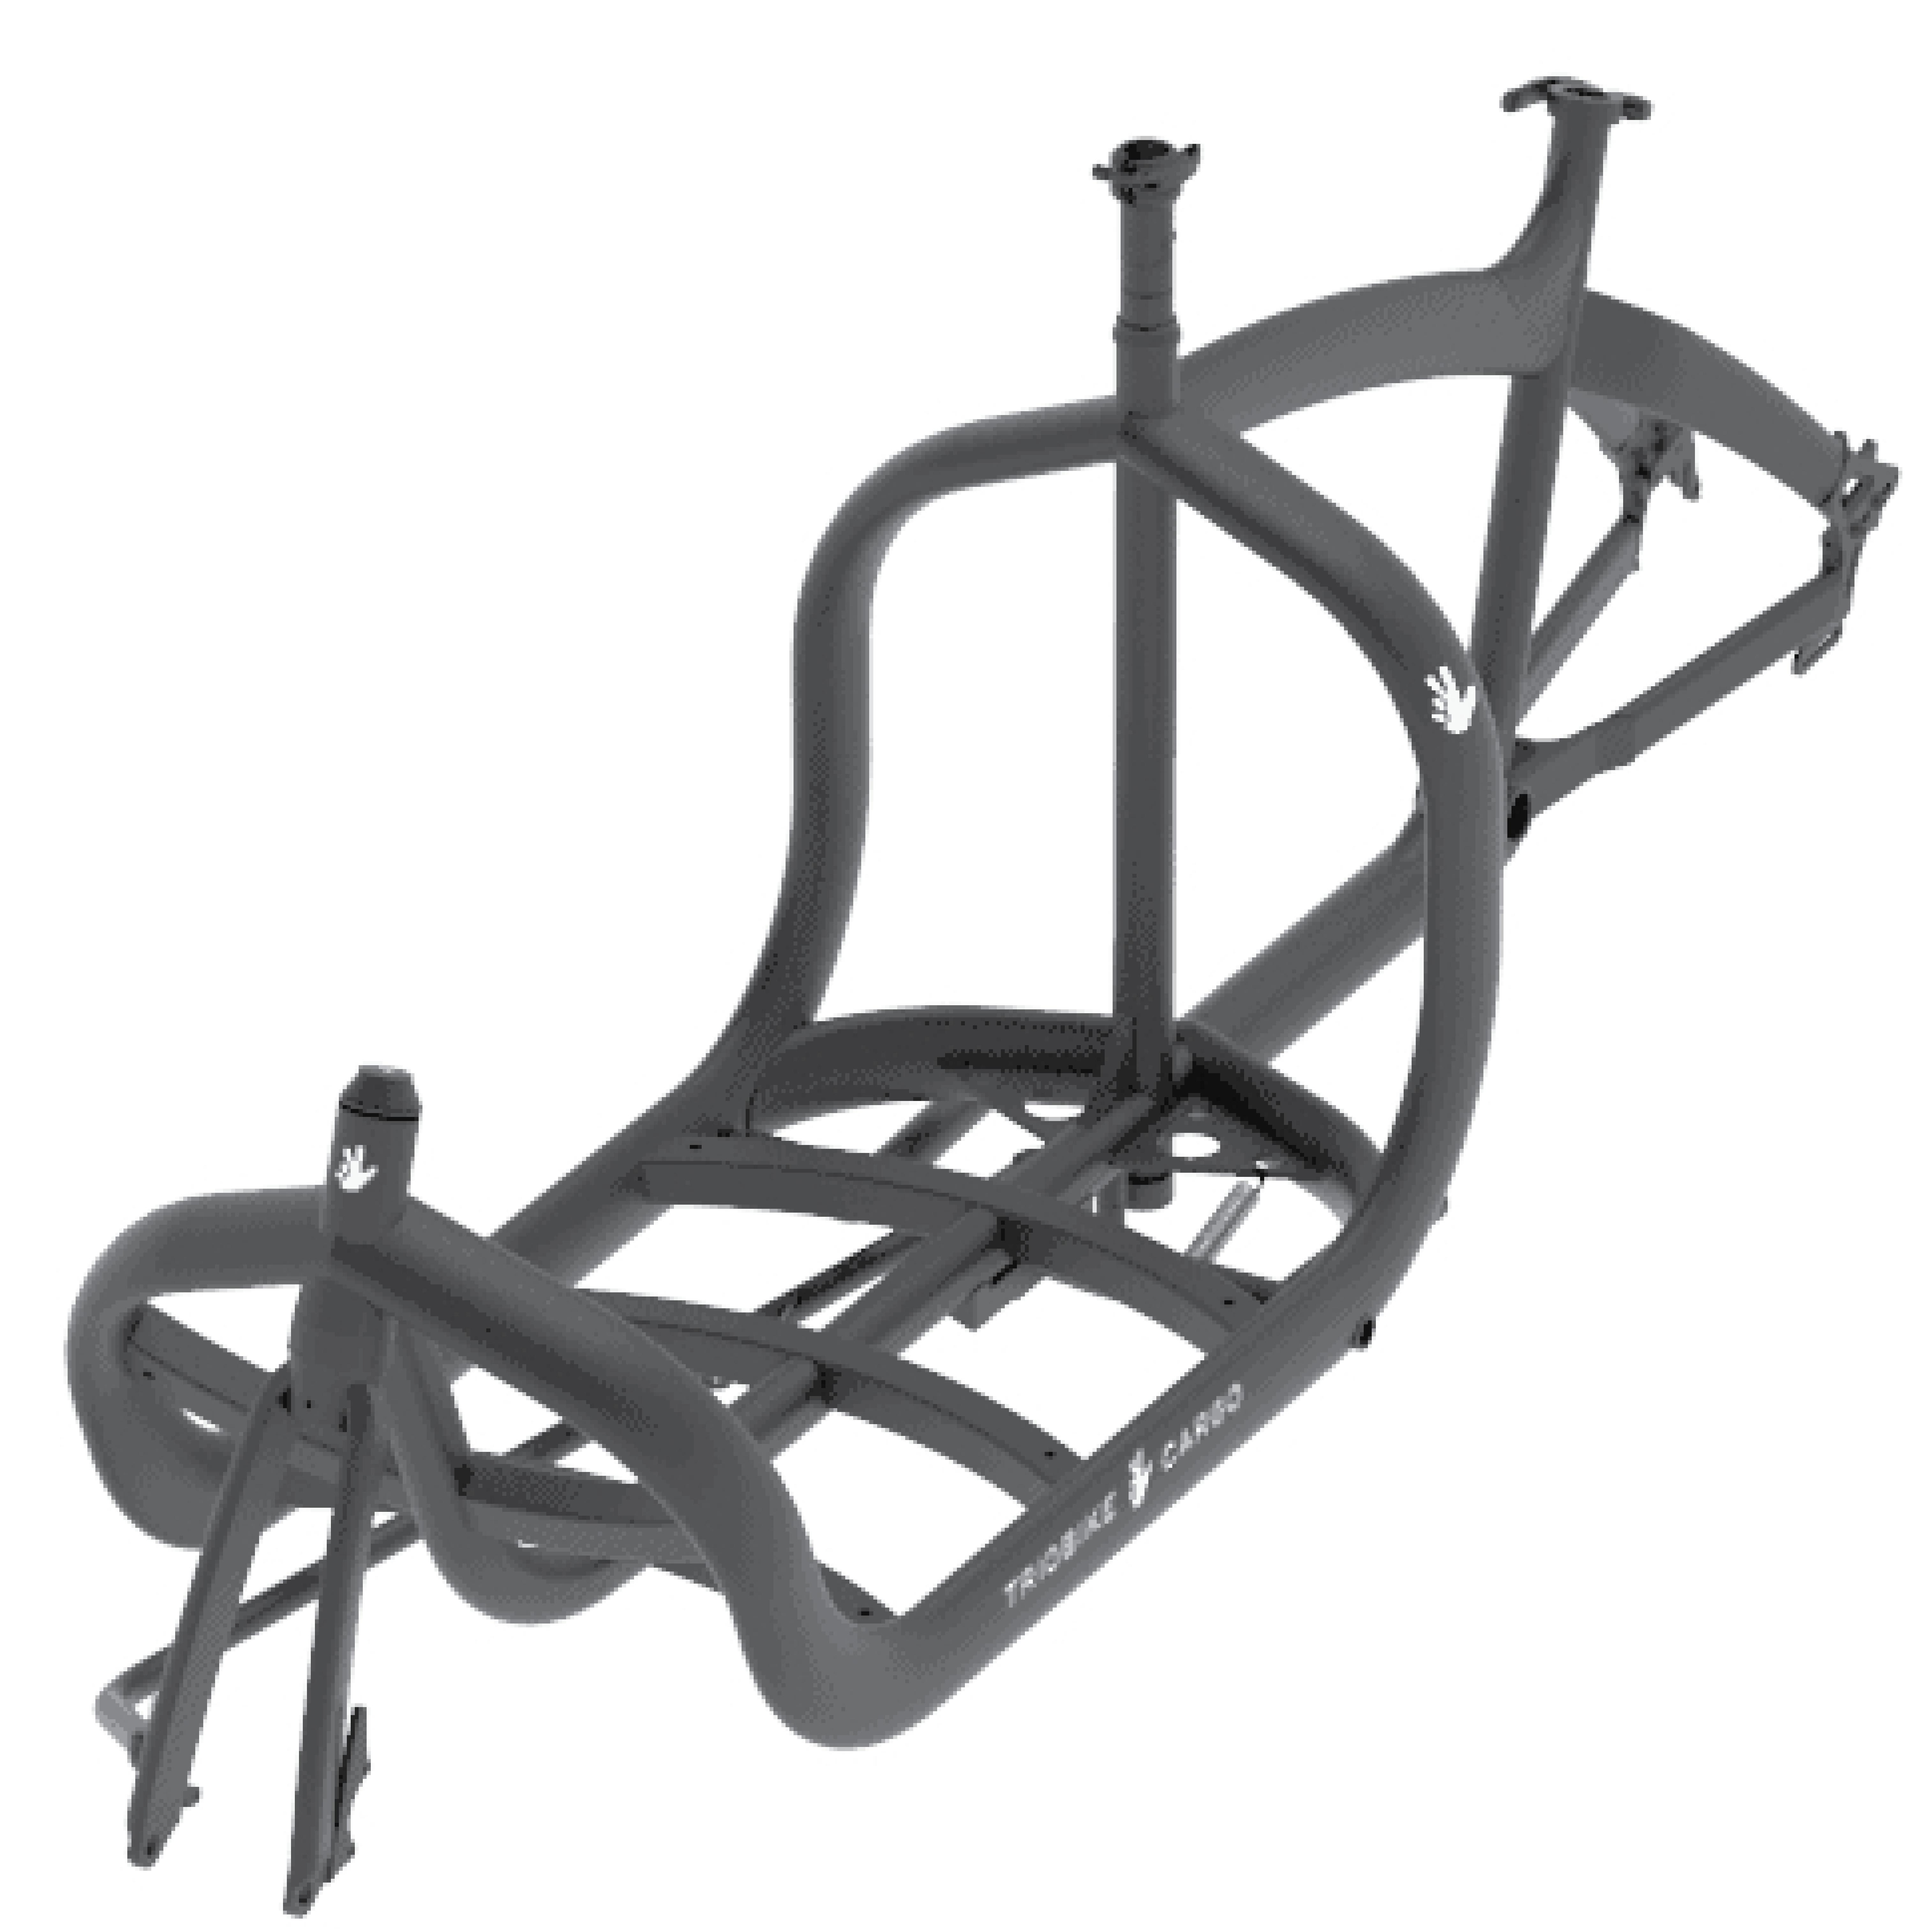 E Lastenrad Frame kit Triobike Schwarz